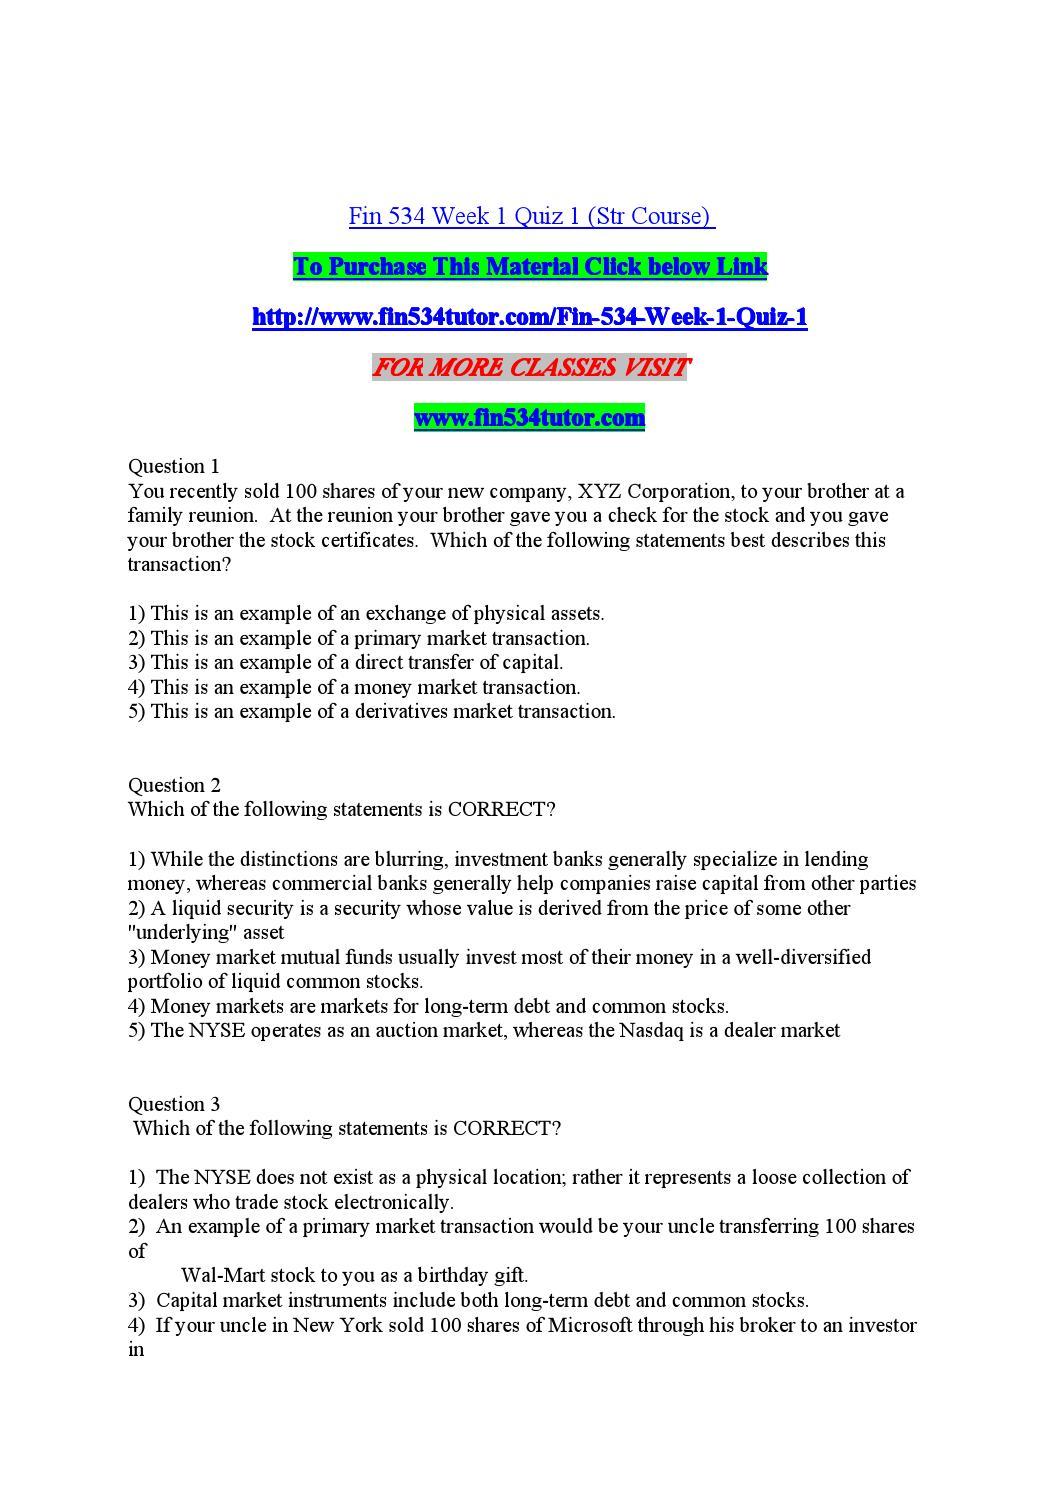 primary market transaction example